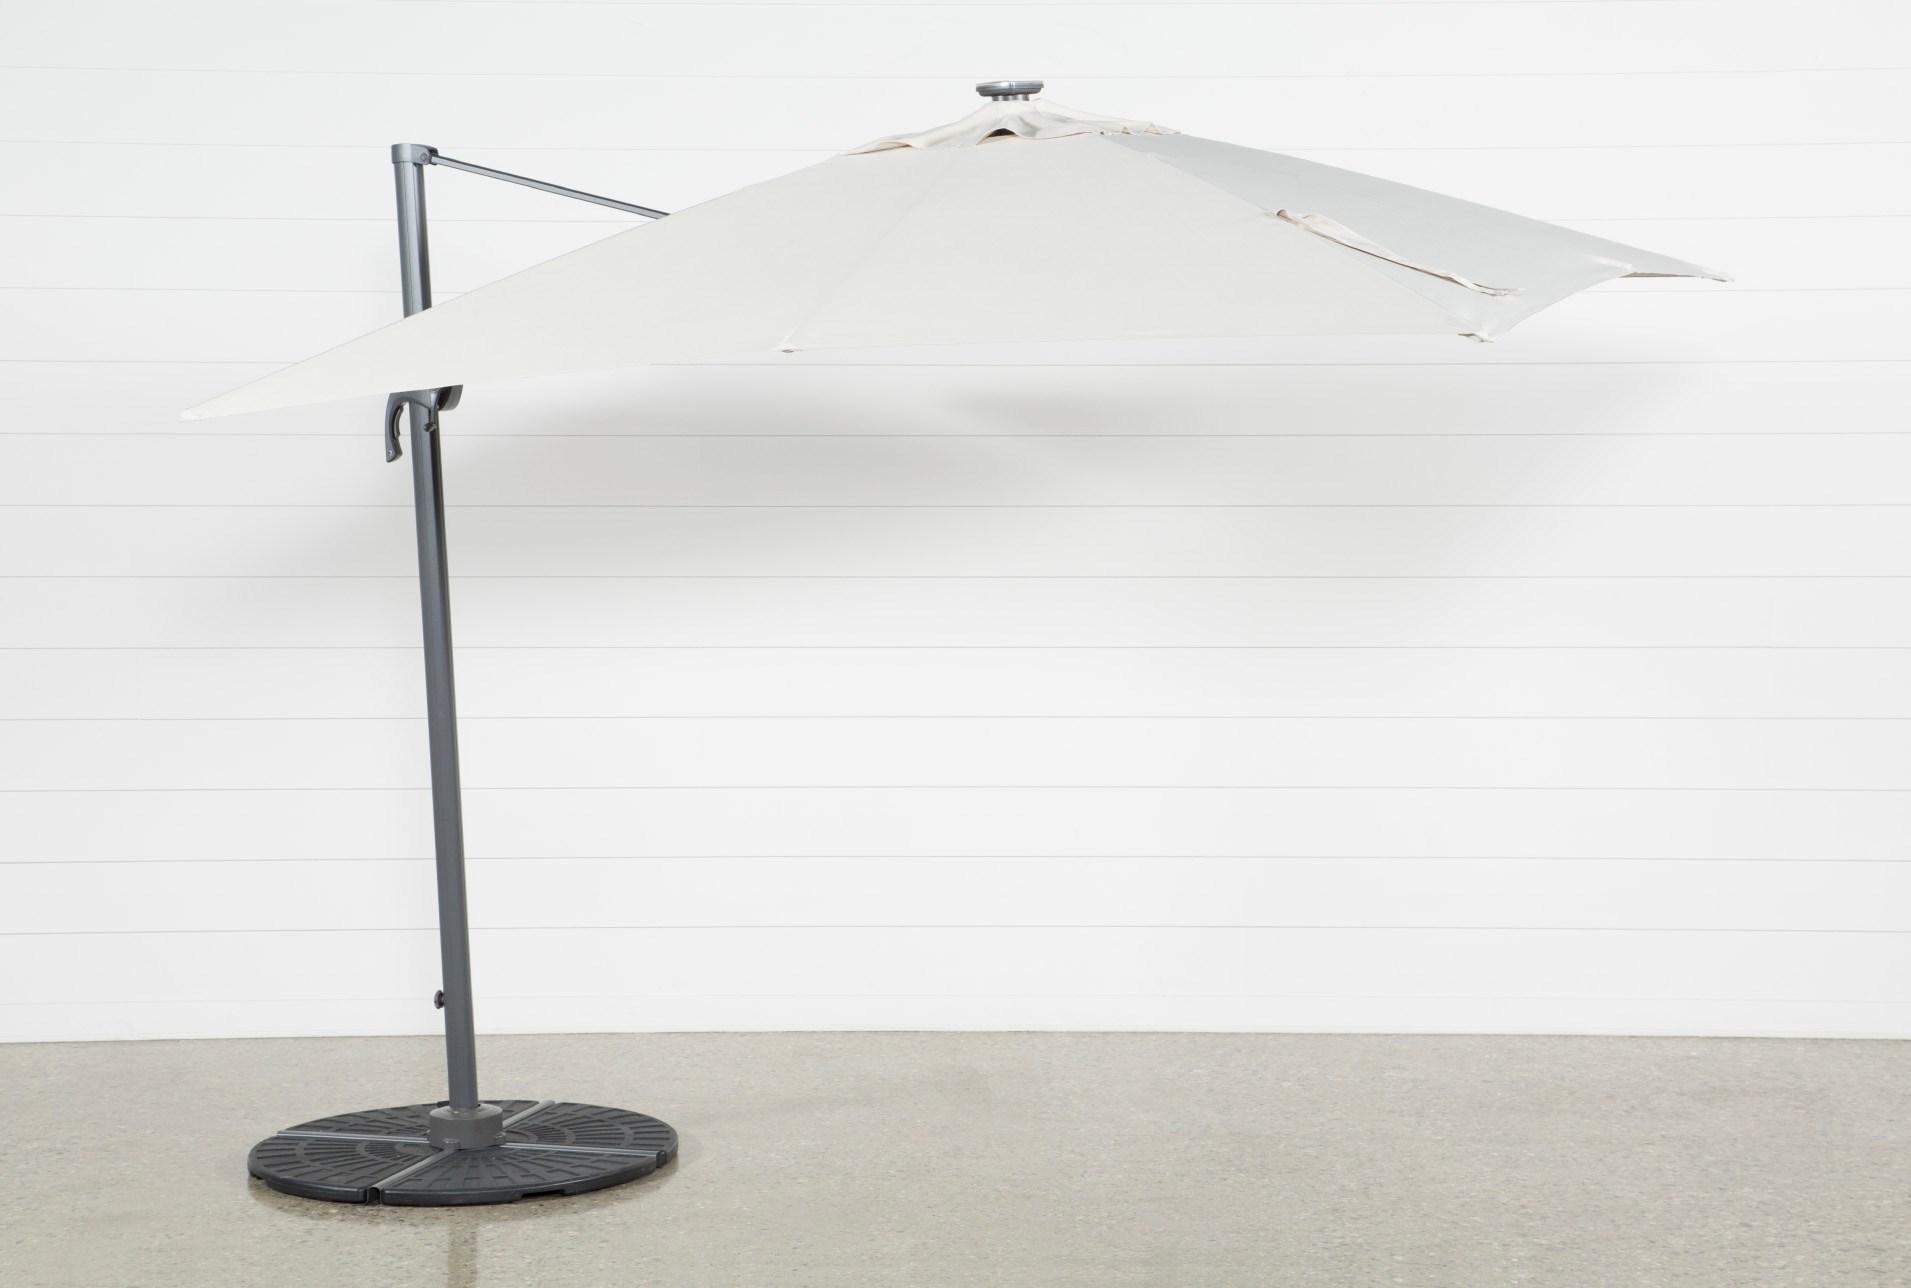 outdoor cantilever beige umbrella with lights and speaker living spaces. Black Bedroom Furniture Sets. Home Design Ideas